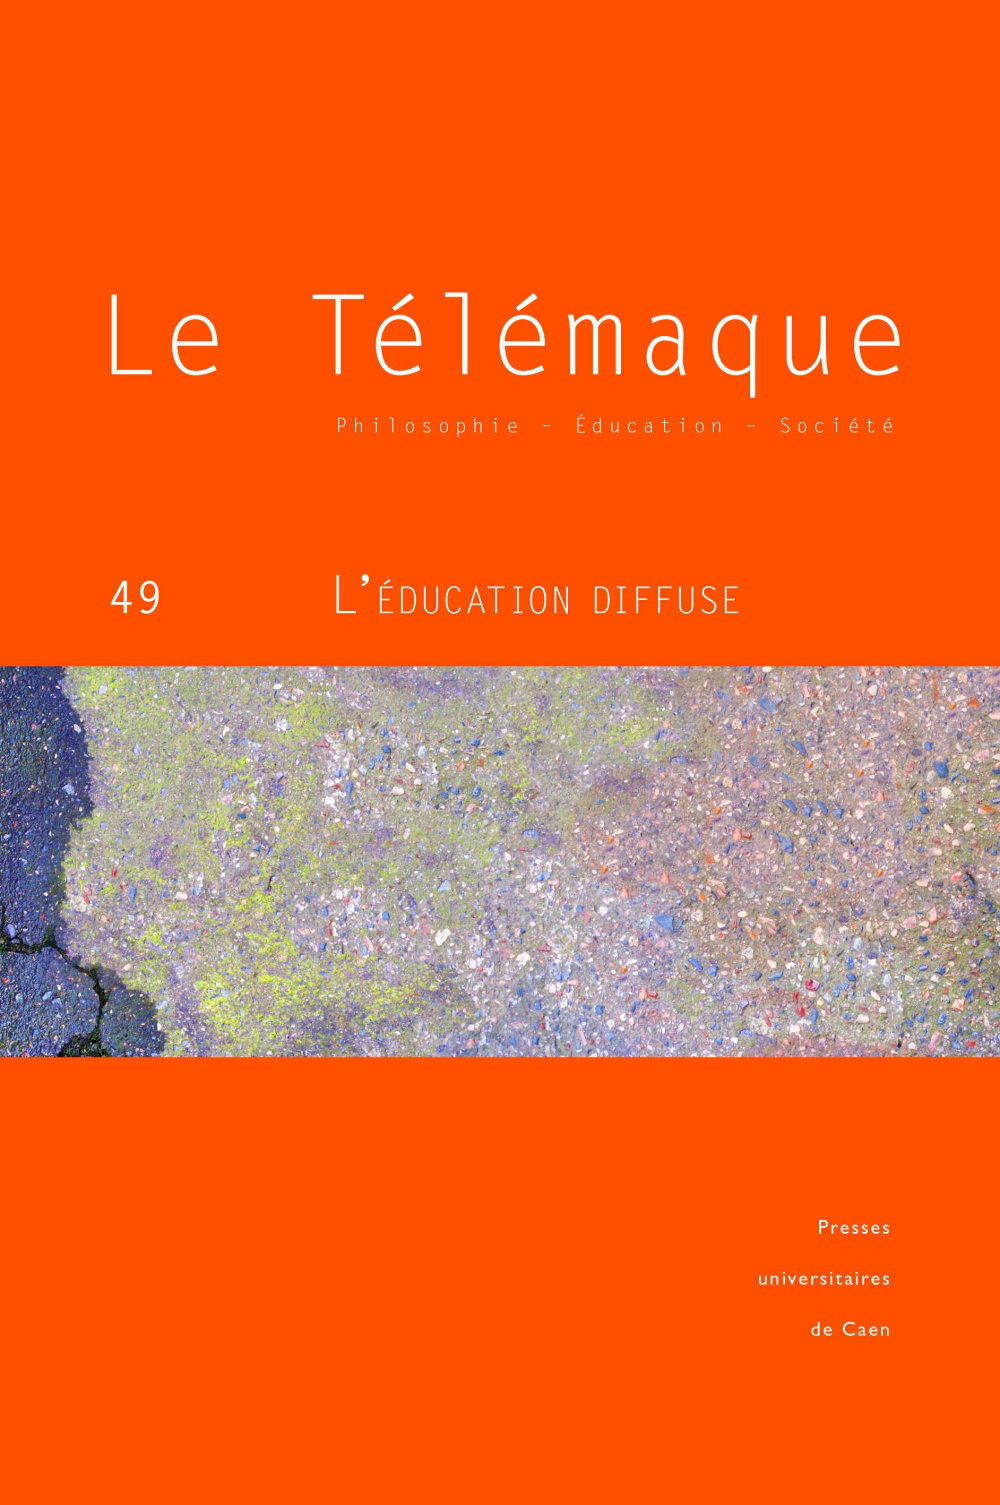 LE TELEMAQUE, N  49/2016. L'EDUCATION DIFFUSE